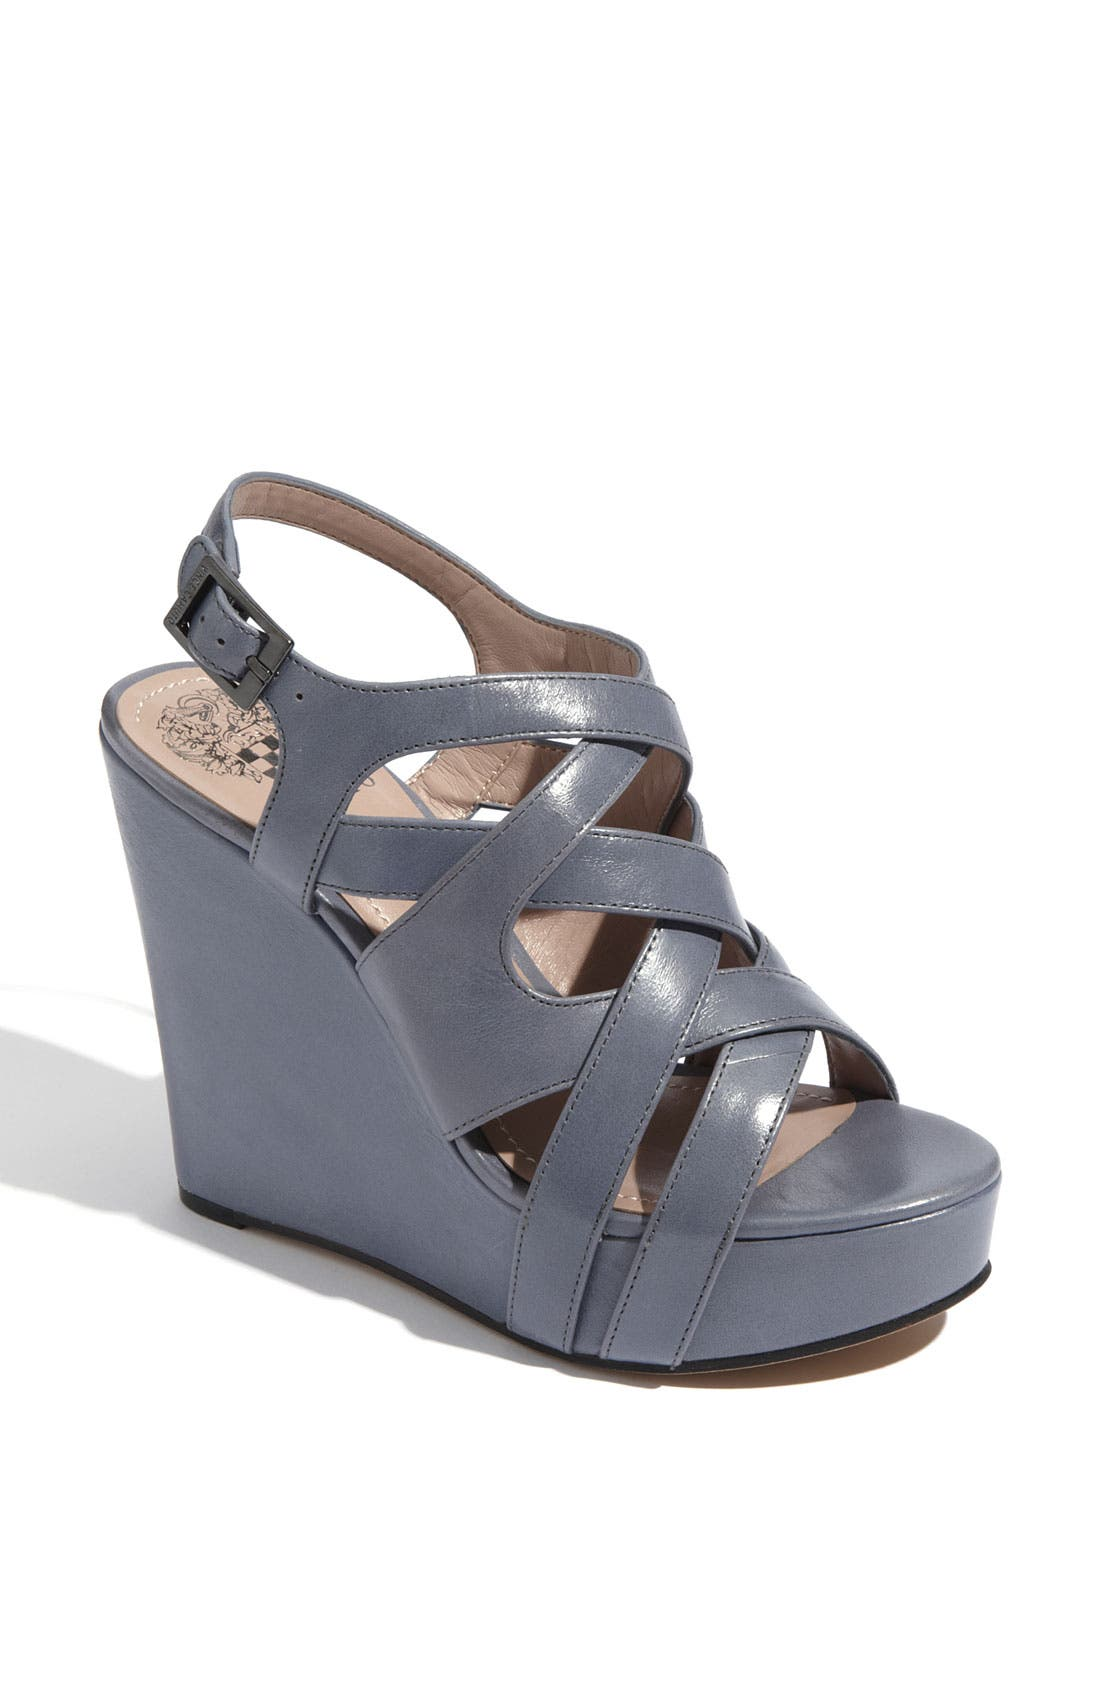 Main Image - Vince Camuto 'Shivona' Sandal